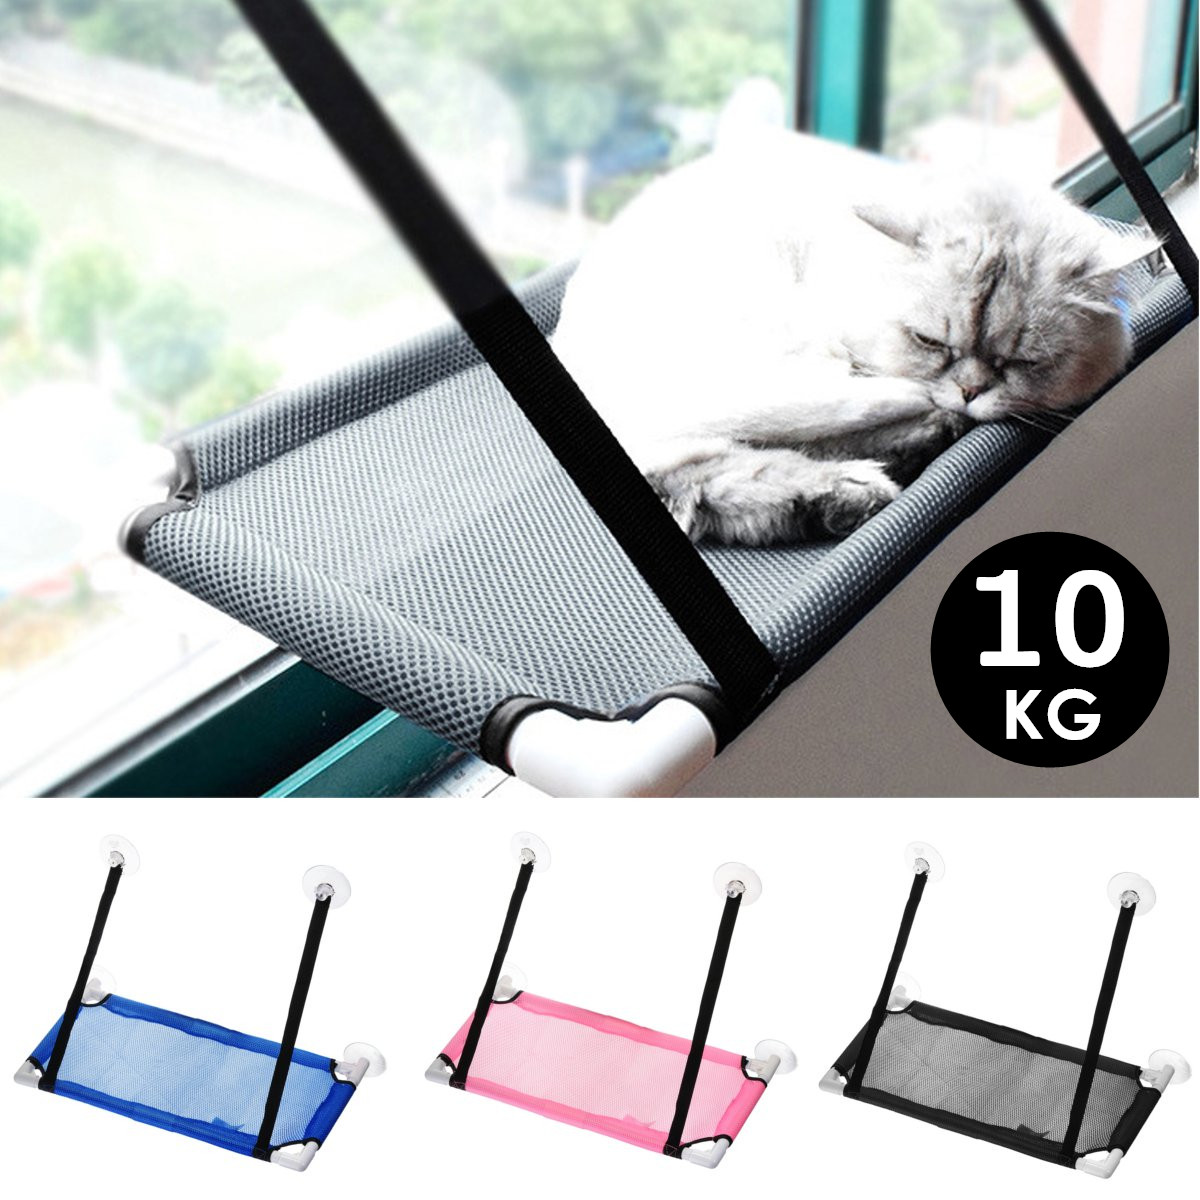 10kg Pet Hammock Cat Basking Window Mounted Seat Home